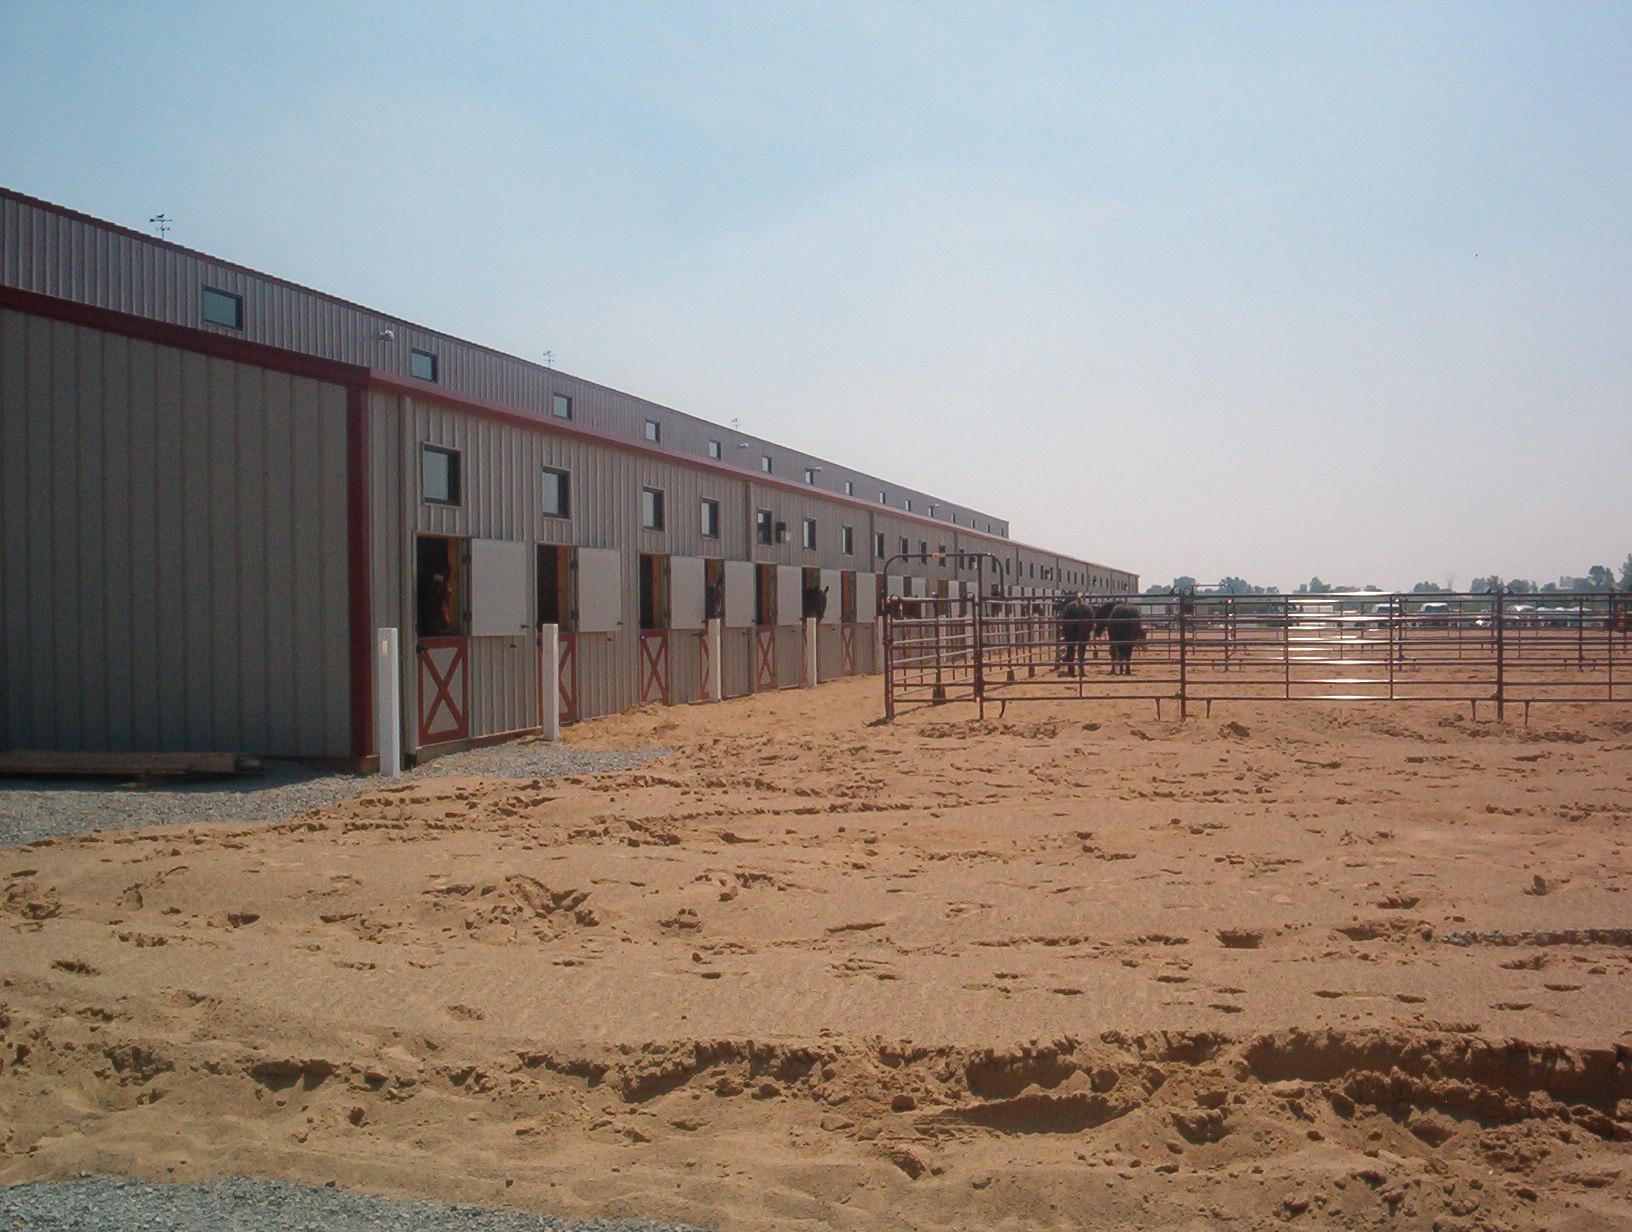 Equestrian Arena Sand